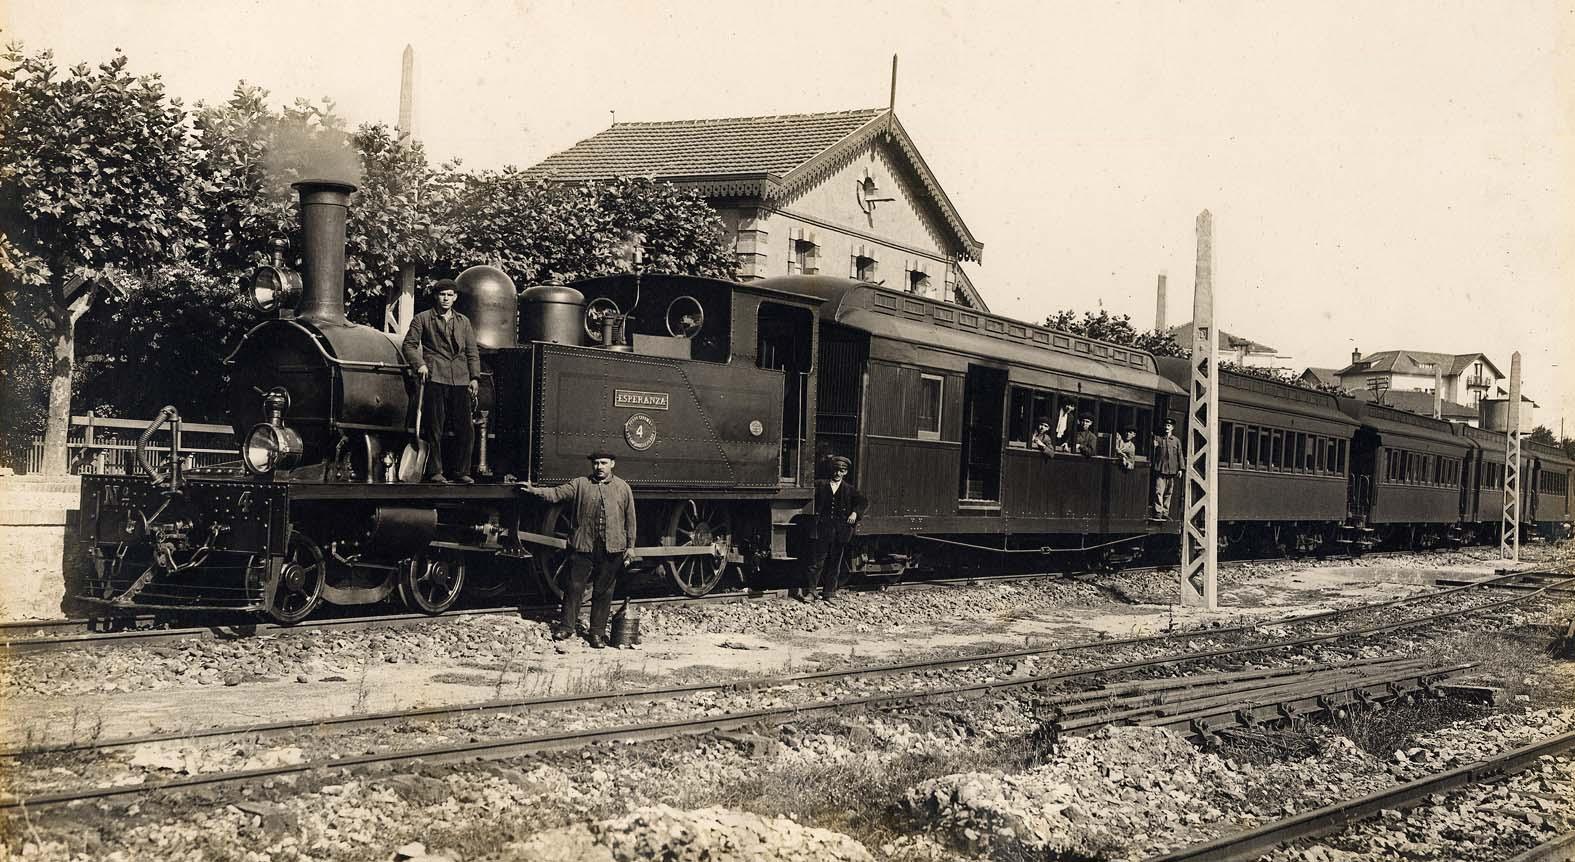 Estacion de Algorta 1927, archivo municipasl de Getxo, fondo J. J. Olaizola